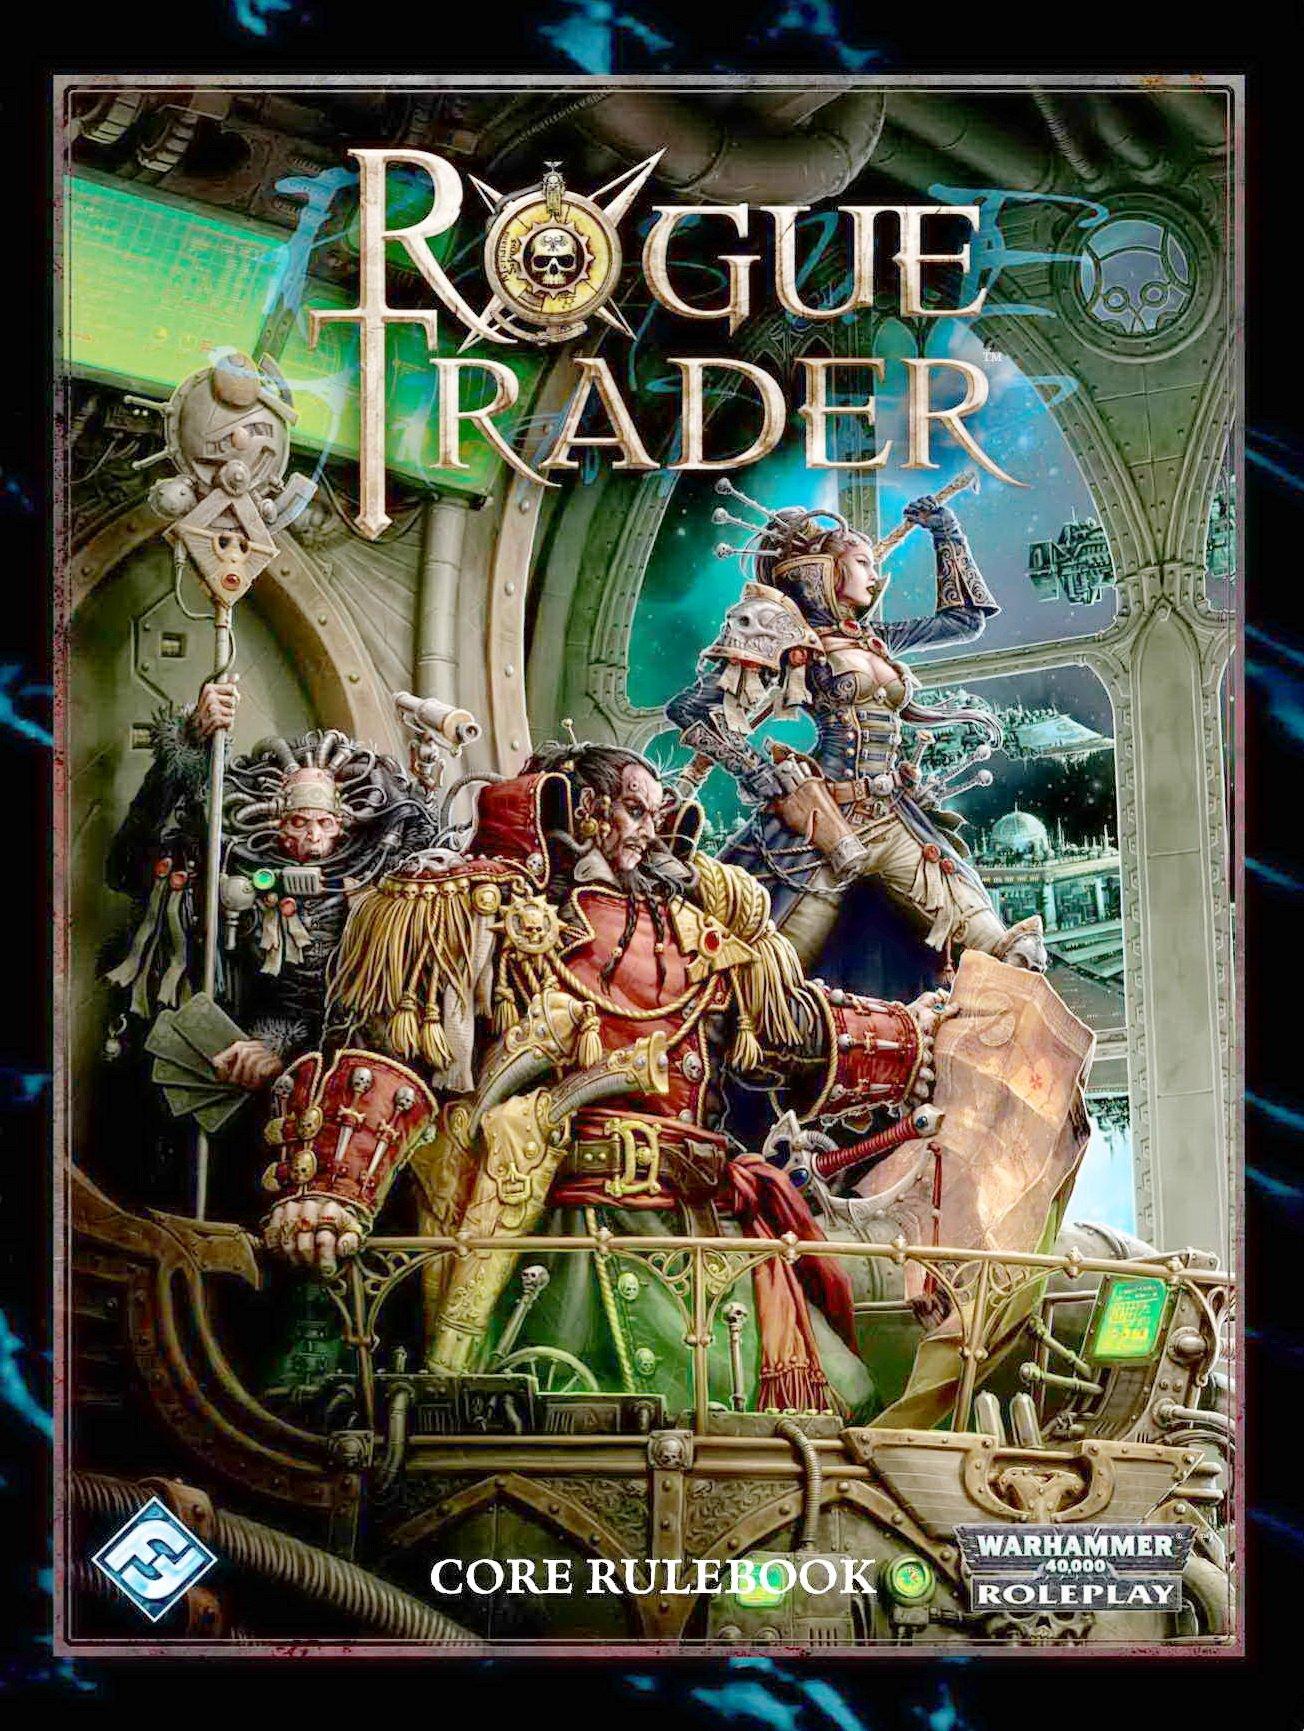 Rogue Trader: Core Rulebook (Warhammer 40,000 40K 30K RPG Roleplay) pdf epub